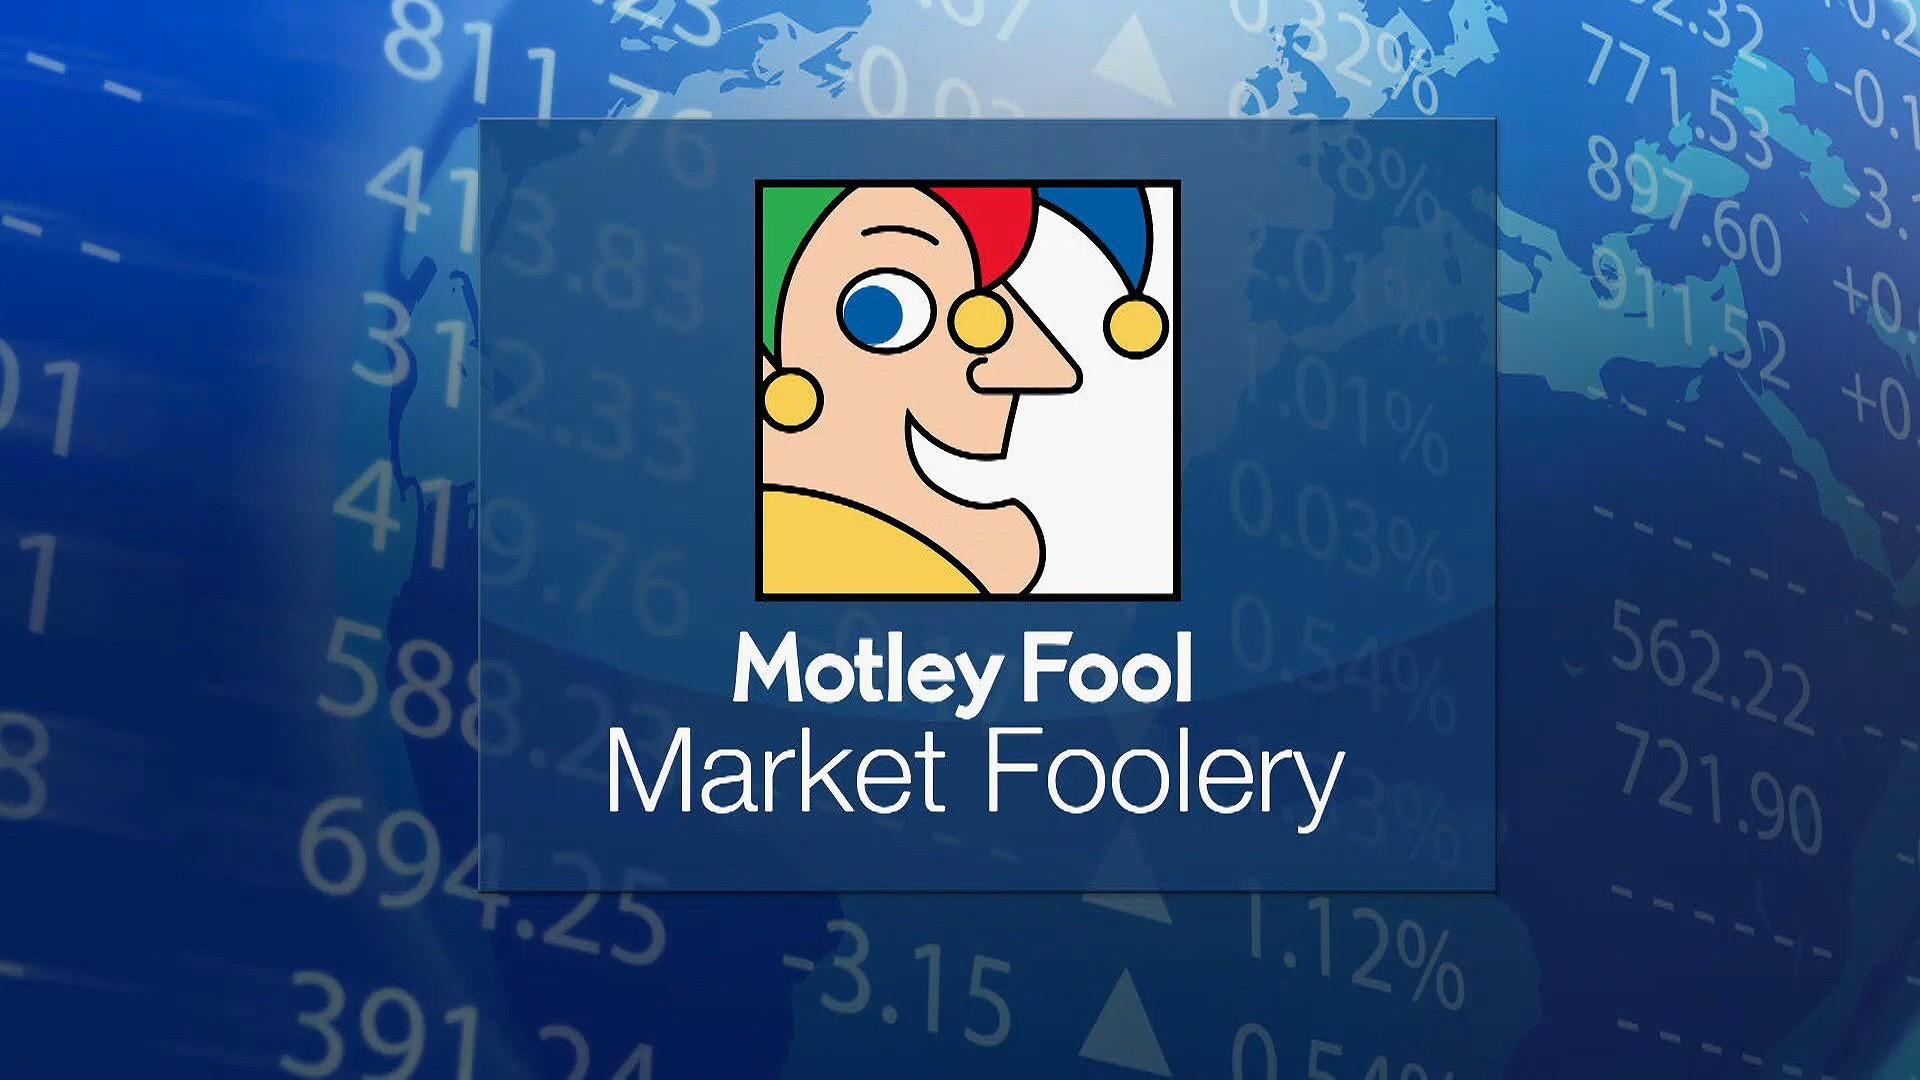 Stock gumshoe motley fool options